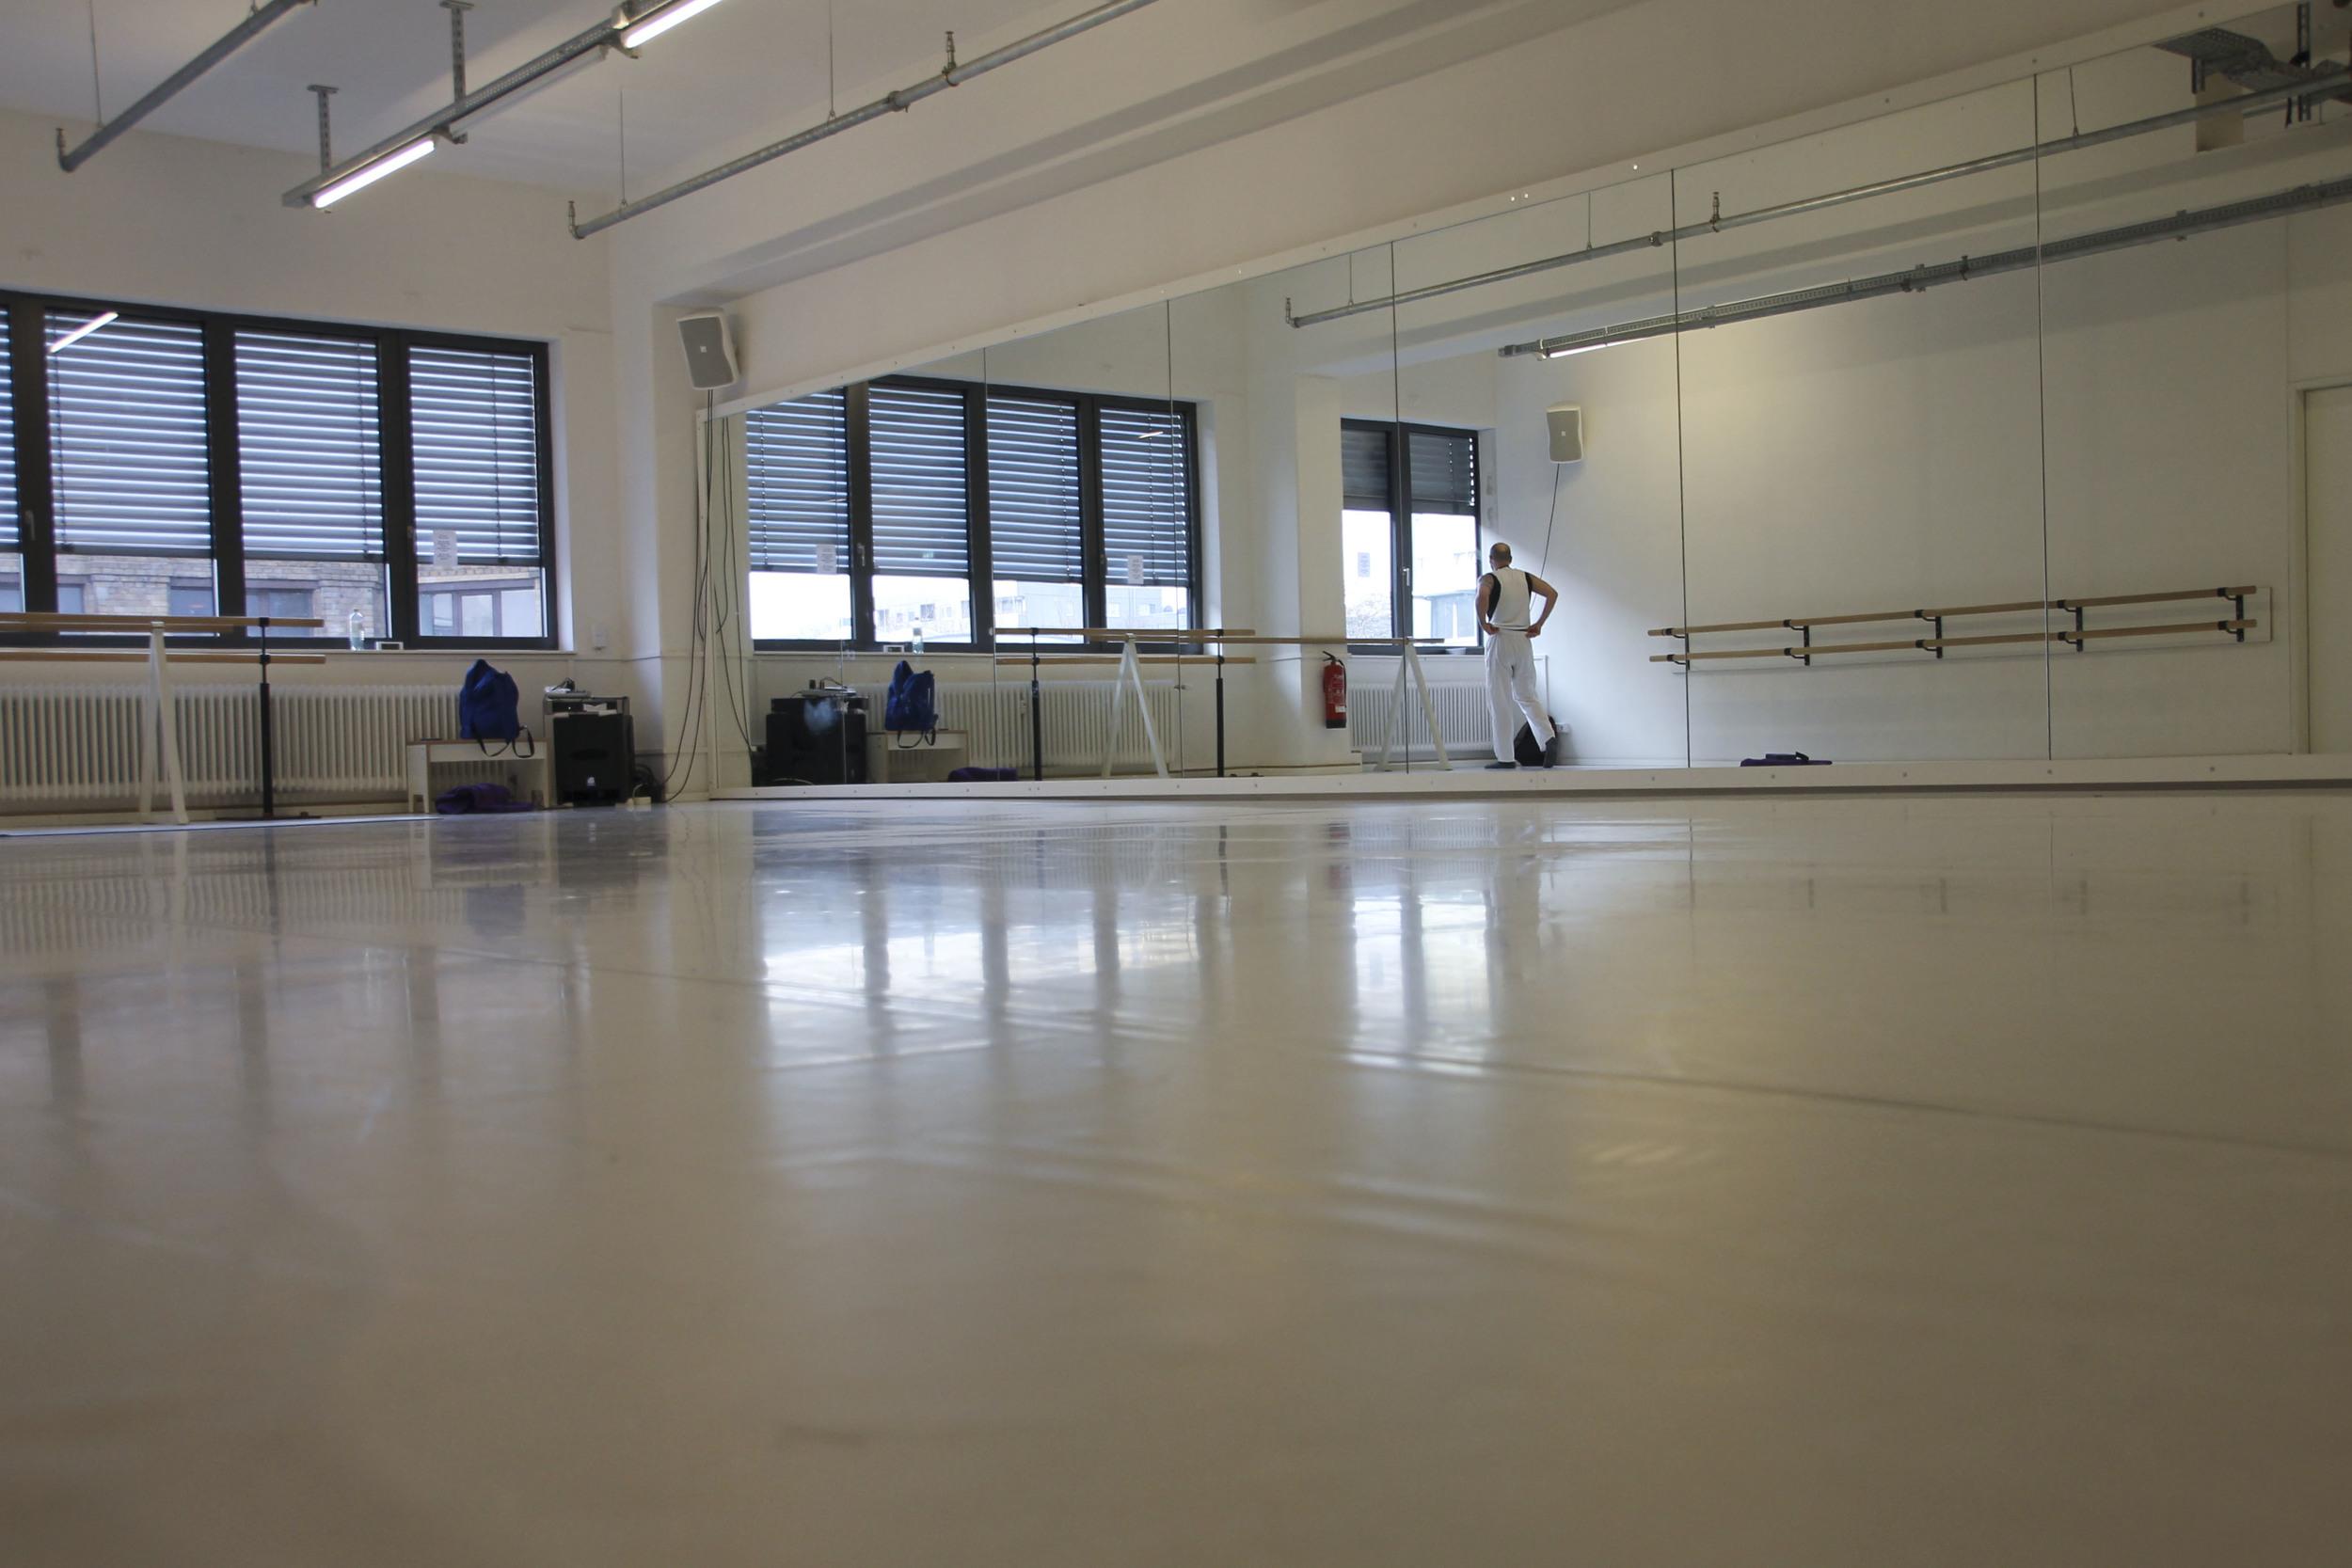 hip hop yoga berlin kreuzberg motions1357.jpg